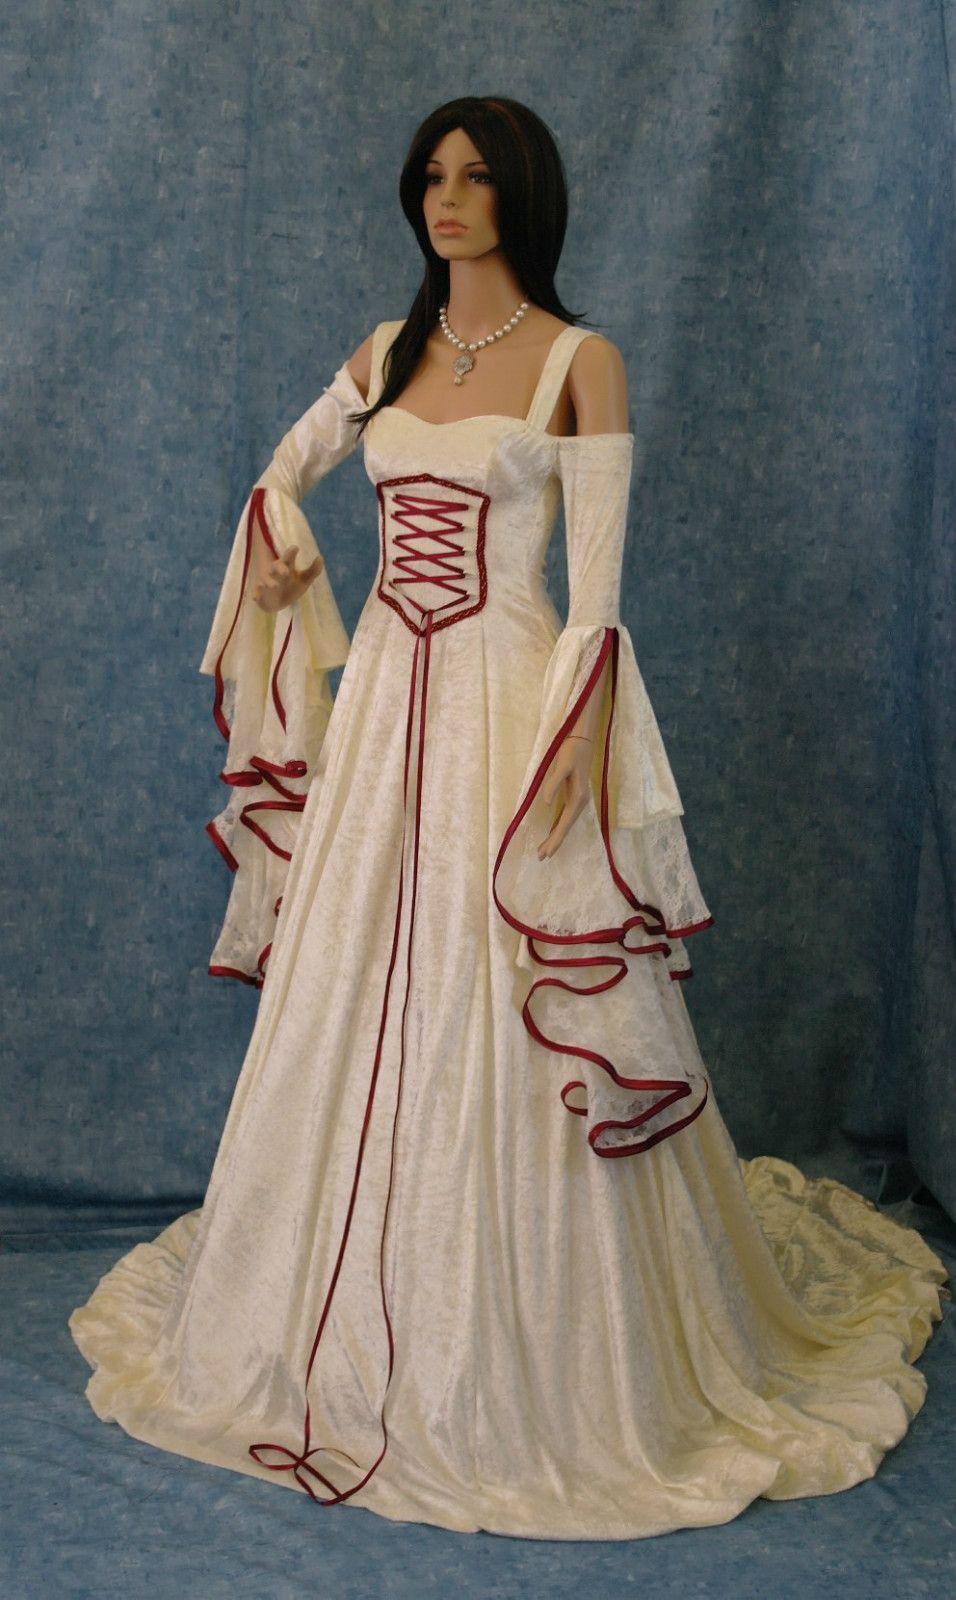 Handfasting Medieval Wedding Dress Lotr Renaissance Fantasy Gown